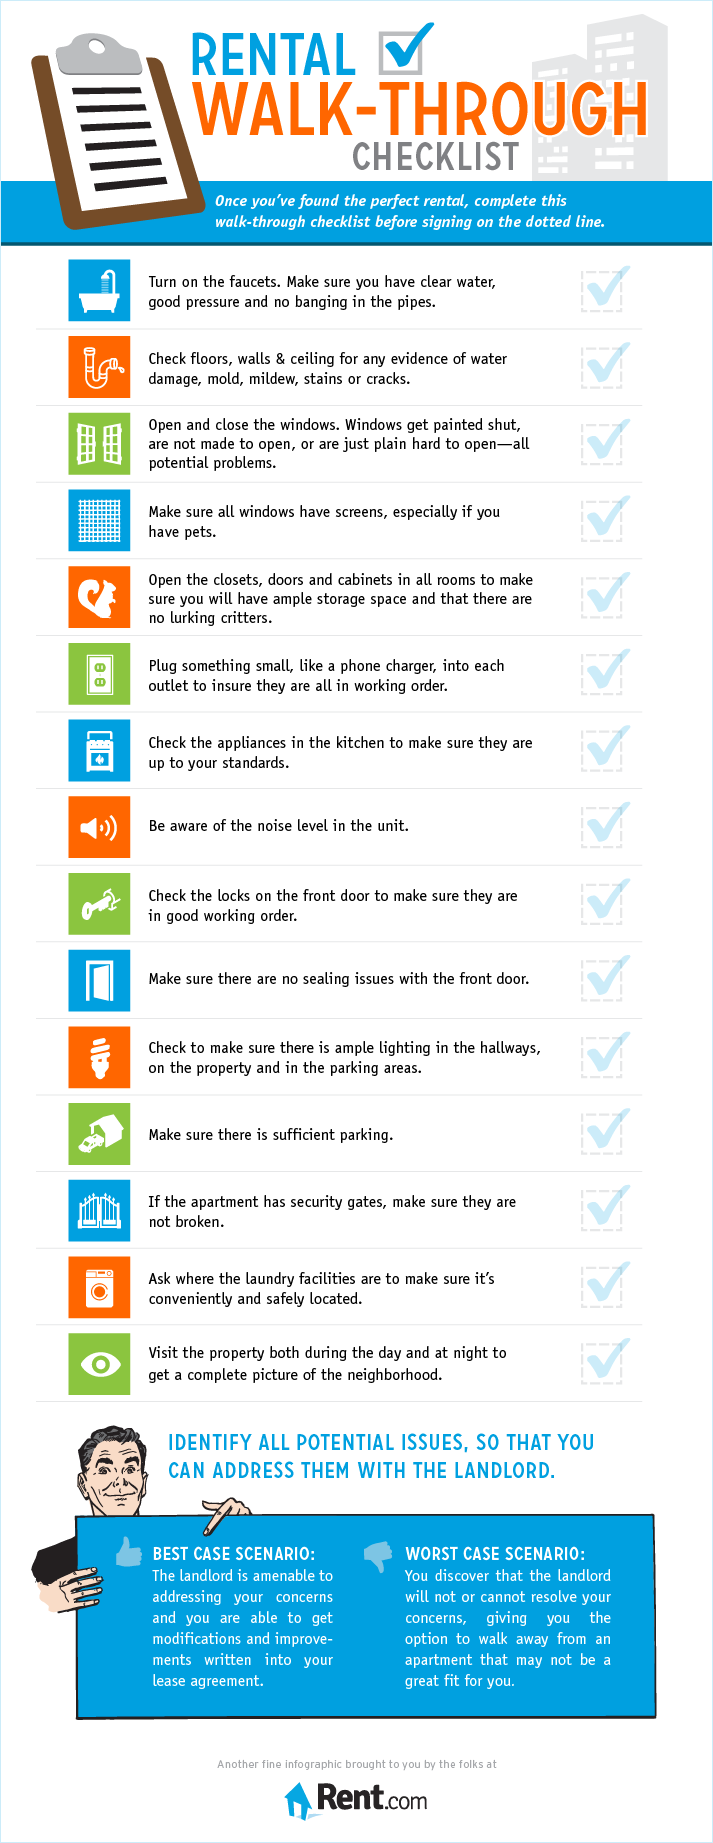 Rental Walk-Through Checklist Infographic - Rent.com Blog